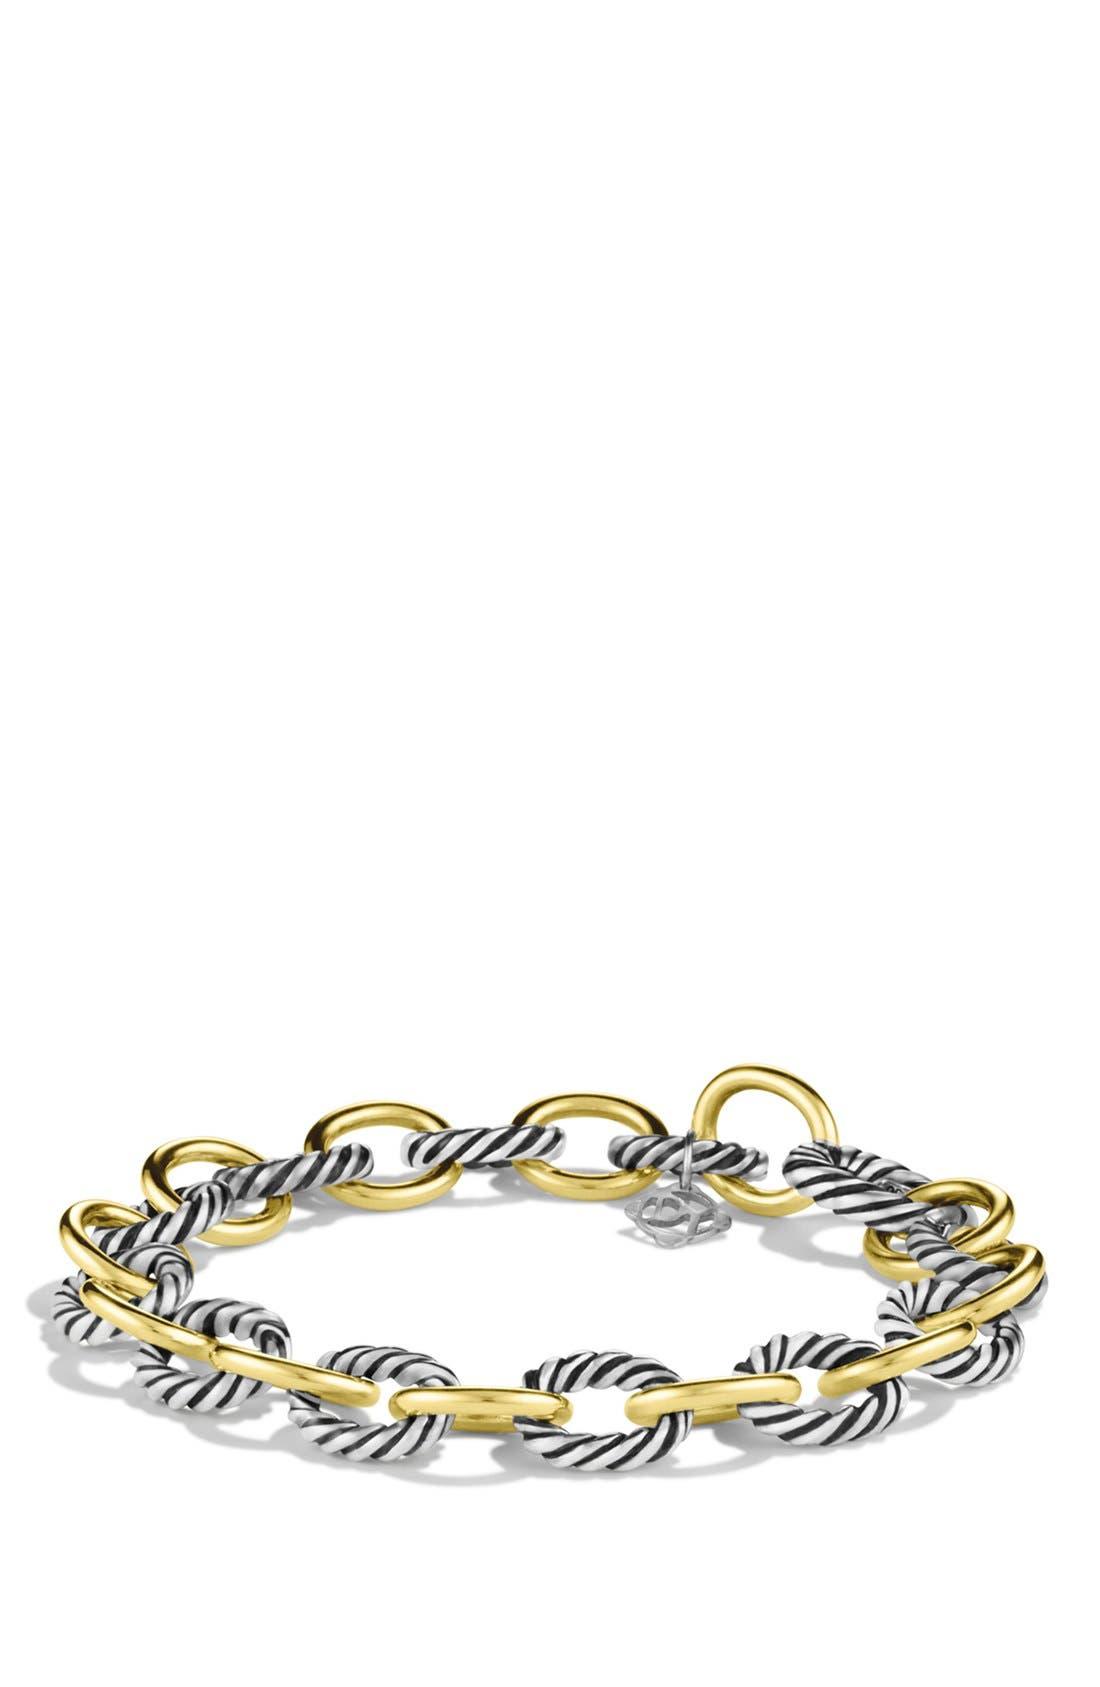 Main Image - David Yurman 'Oval' Link Bracelet with Gold